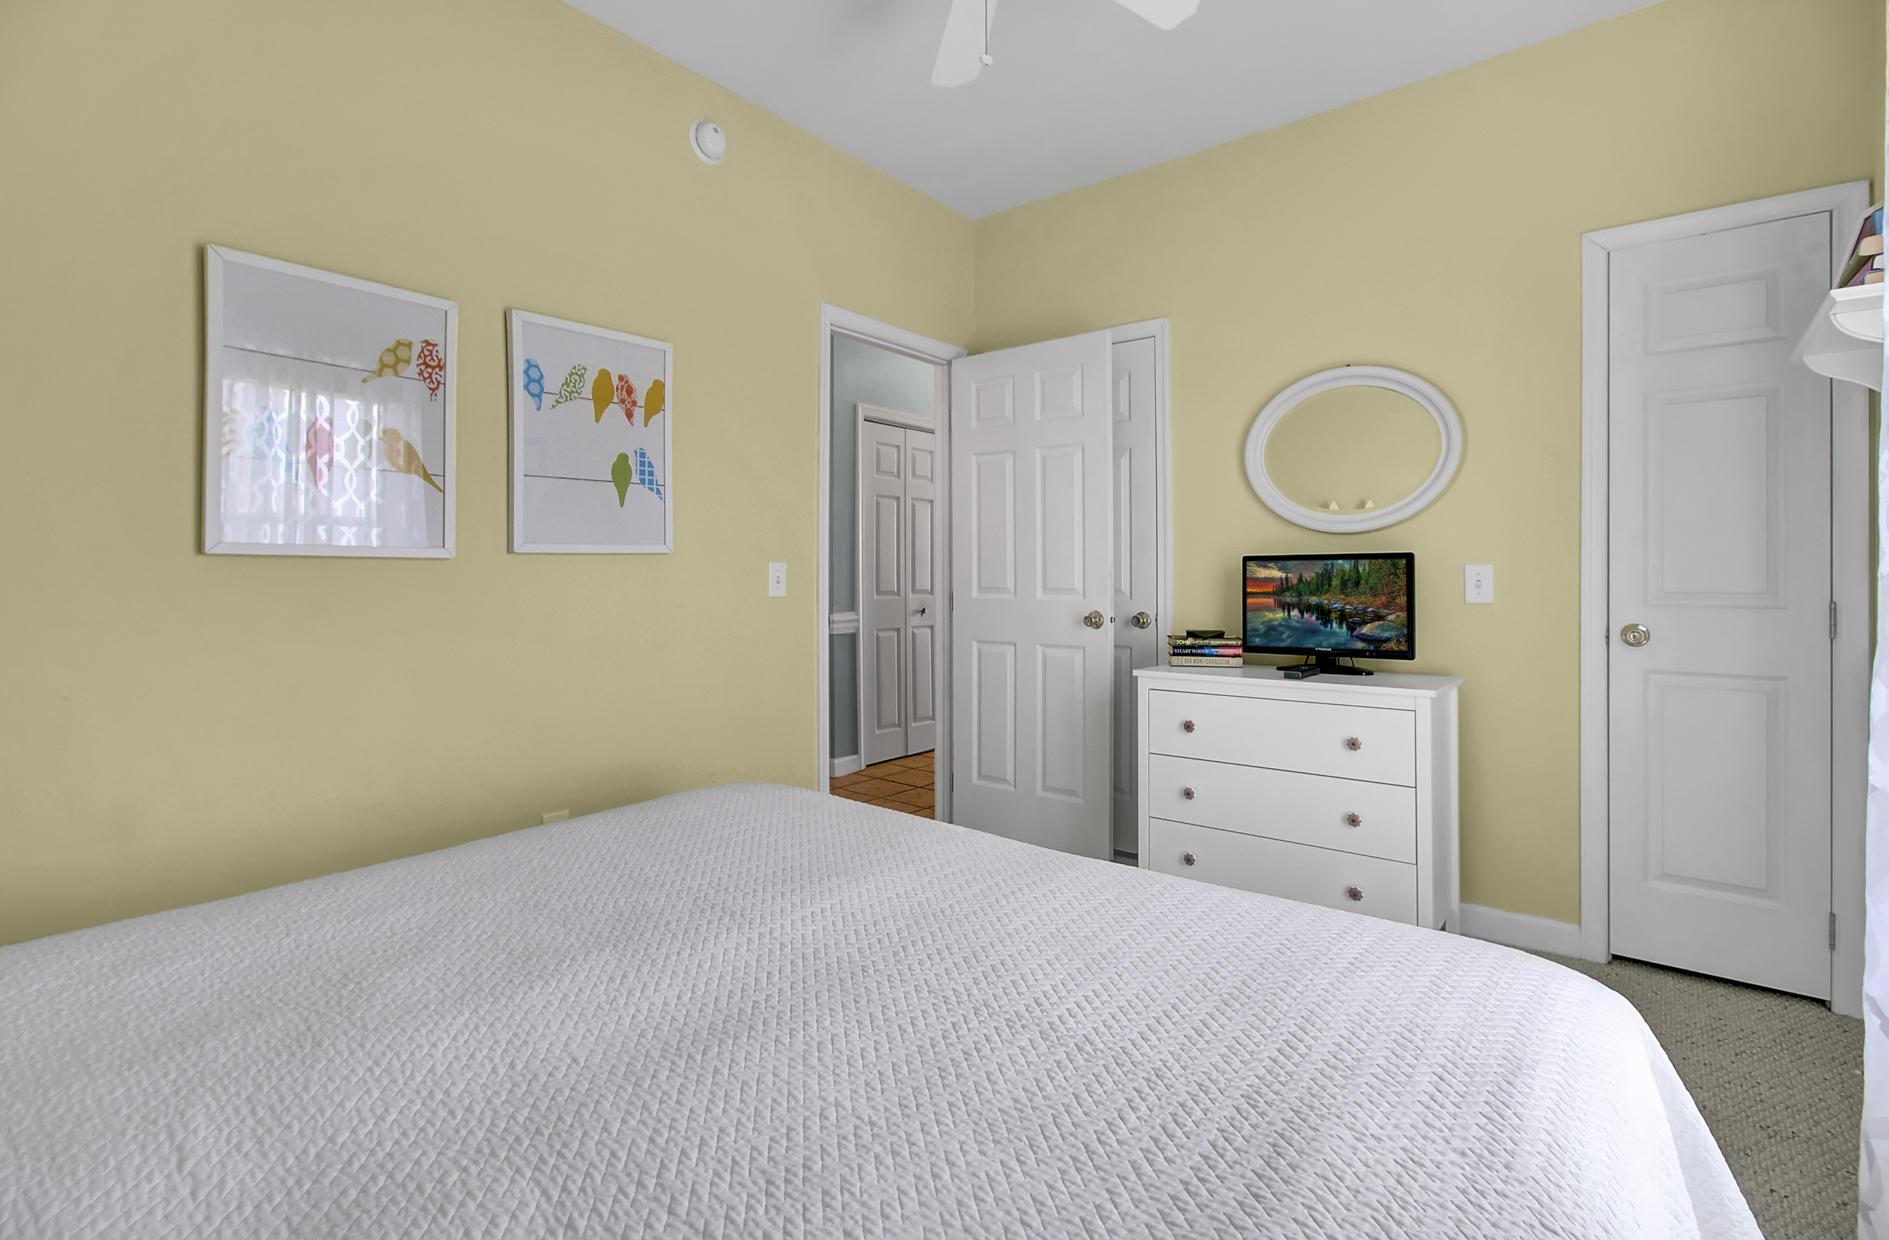 Seaside Villas I Homes For Sale - 111 Arctic, Folly Beach, SC - 21